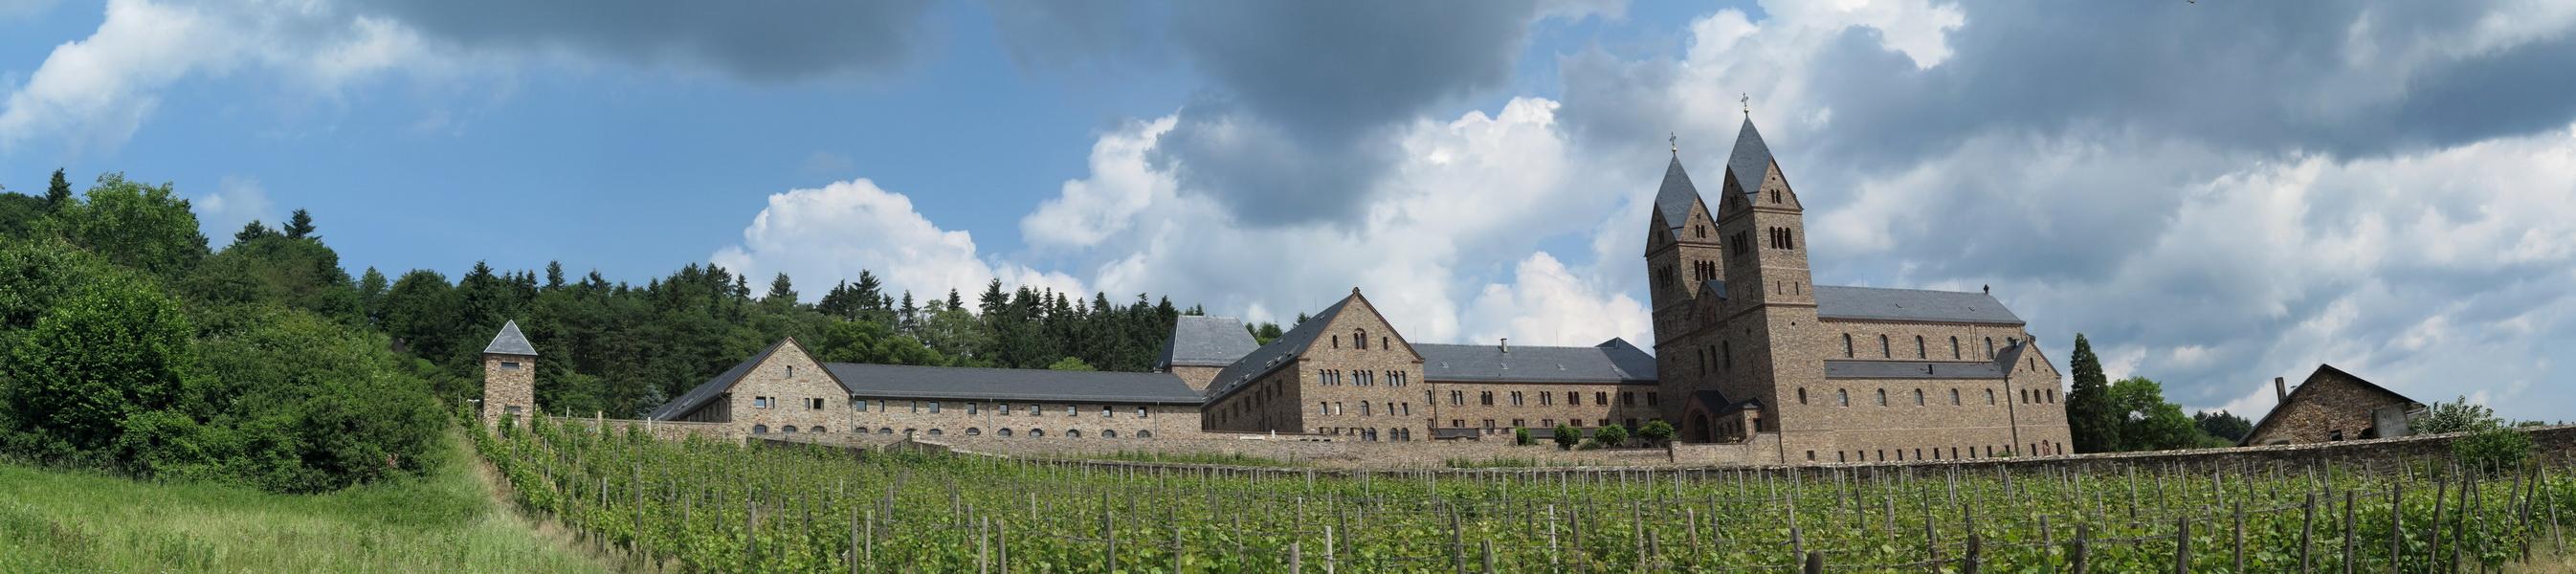 Abtei St.Hildegard